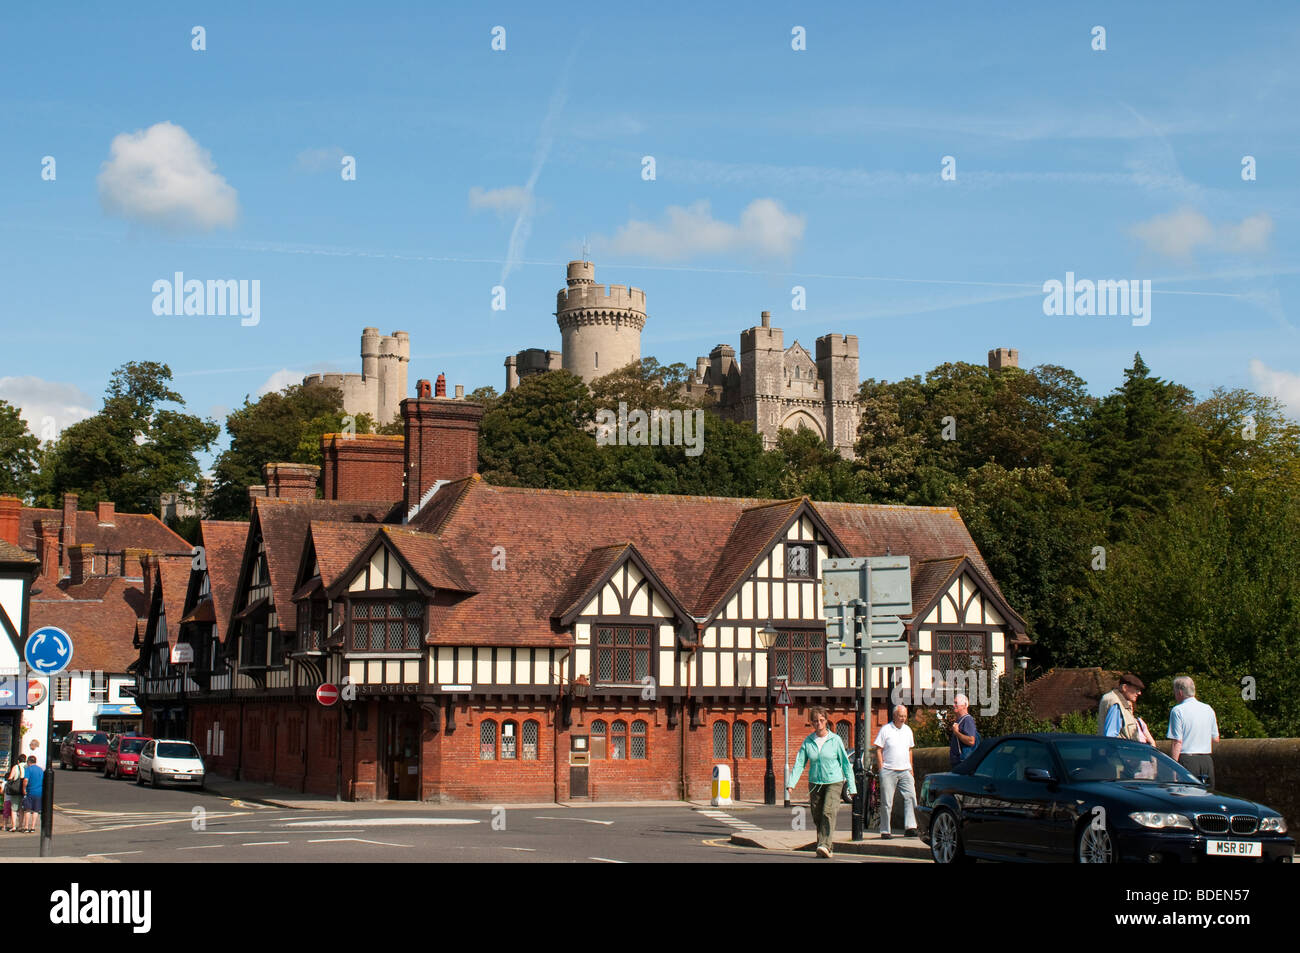 Tudor houses and Arundel Castle, Arundel, West Sussex, UK - Stock Image